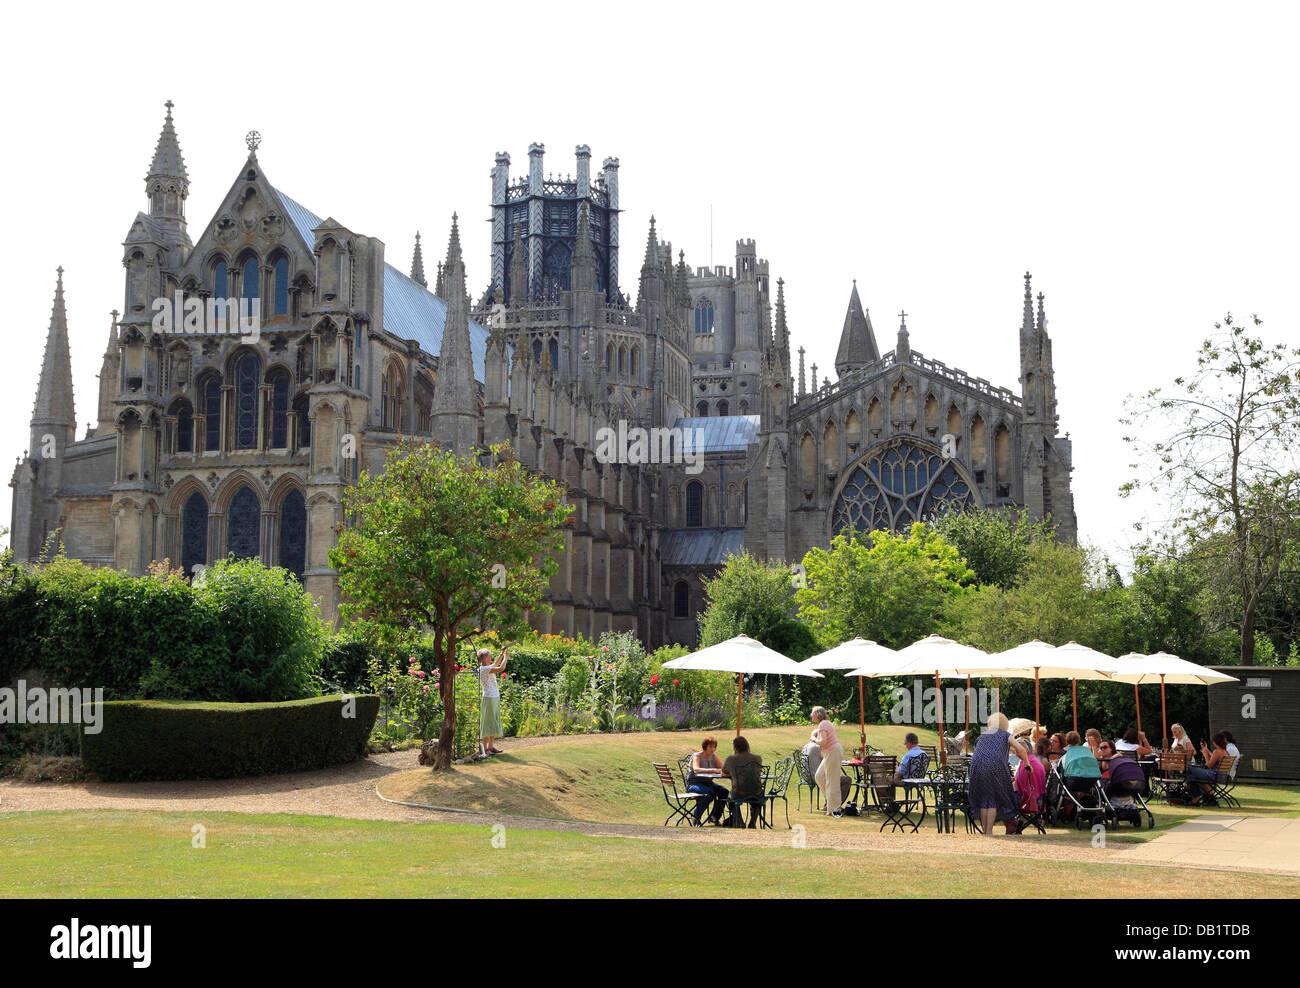 Ely, Almonry Tea Room, Restaurant, Dom, Cambridgeshire, England UK englische Tee Zimmer Kathedralen Stadt Städte Stockbild